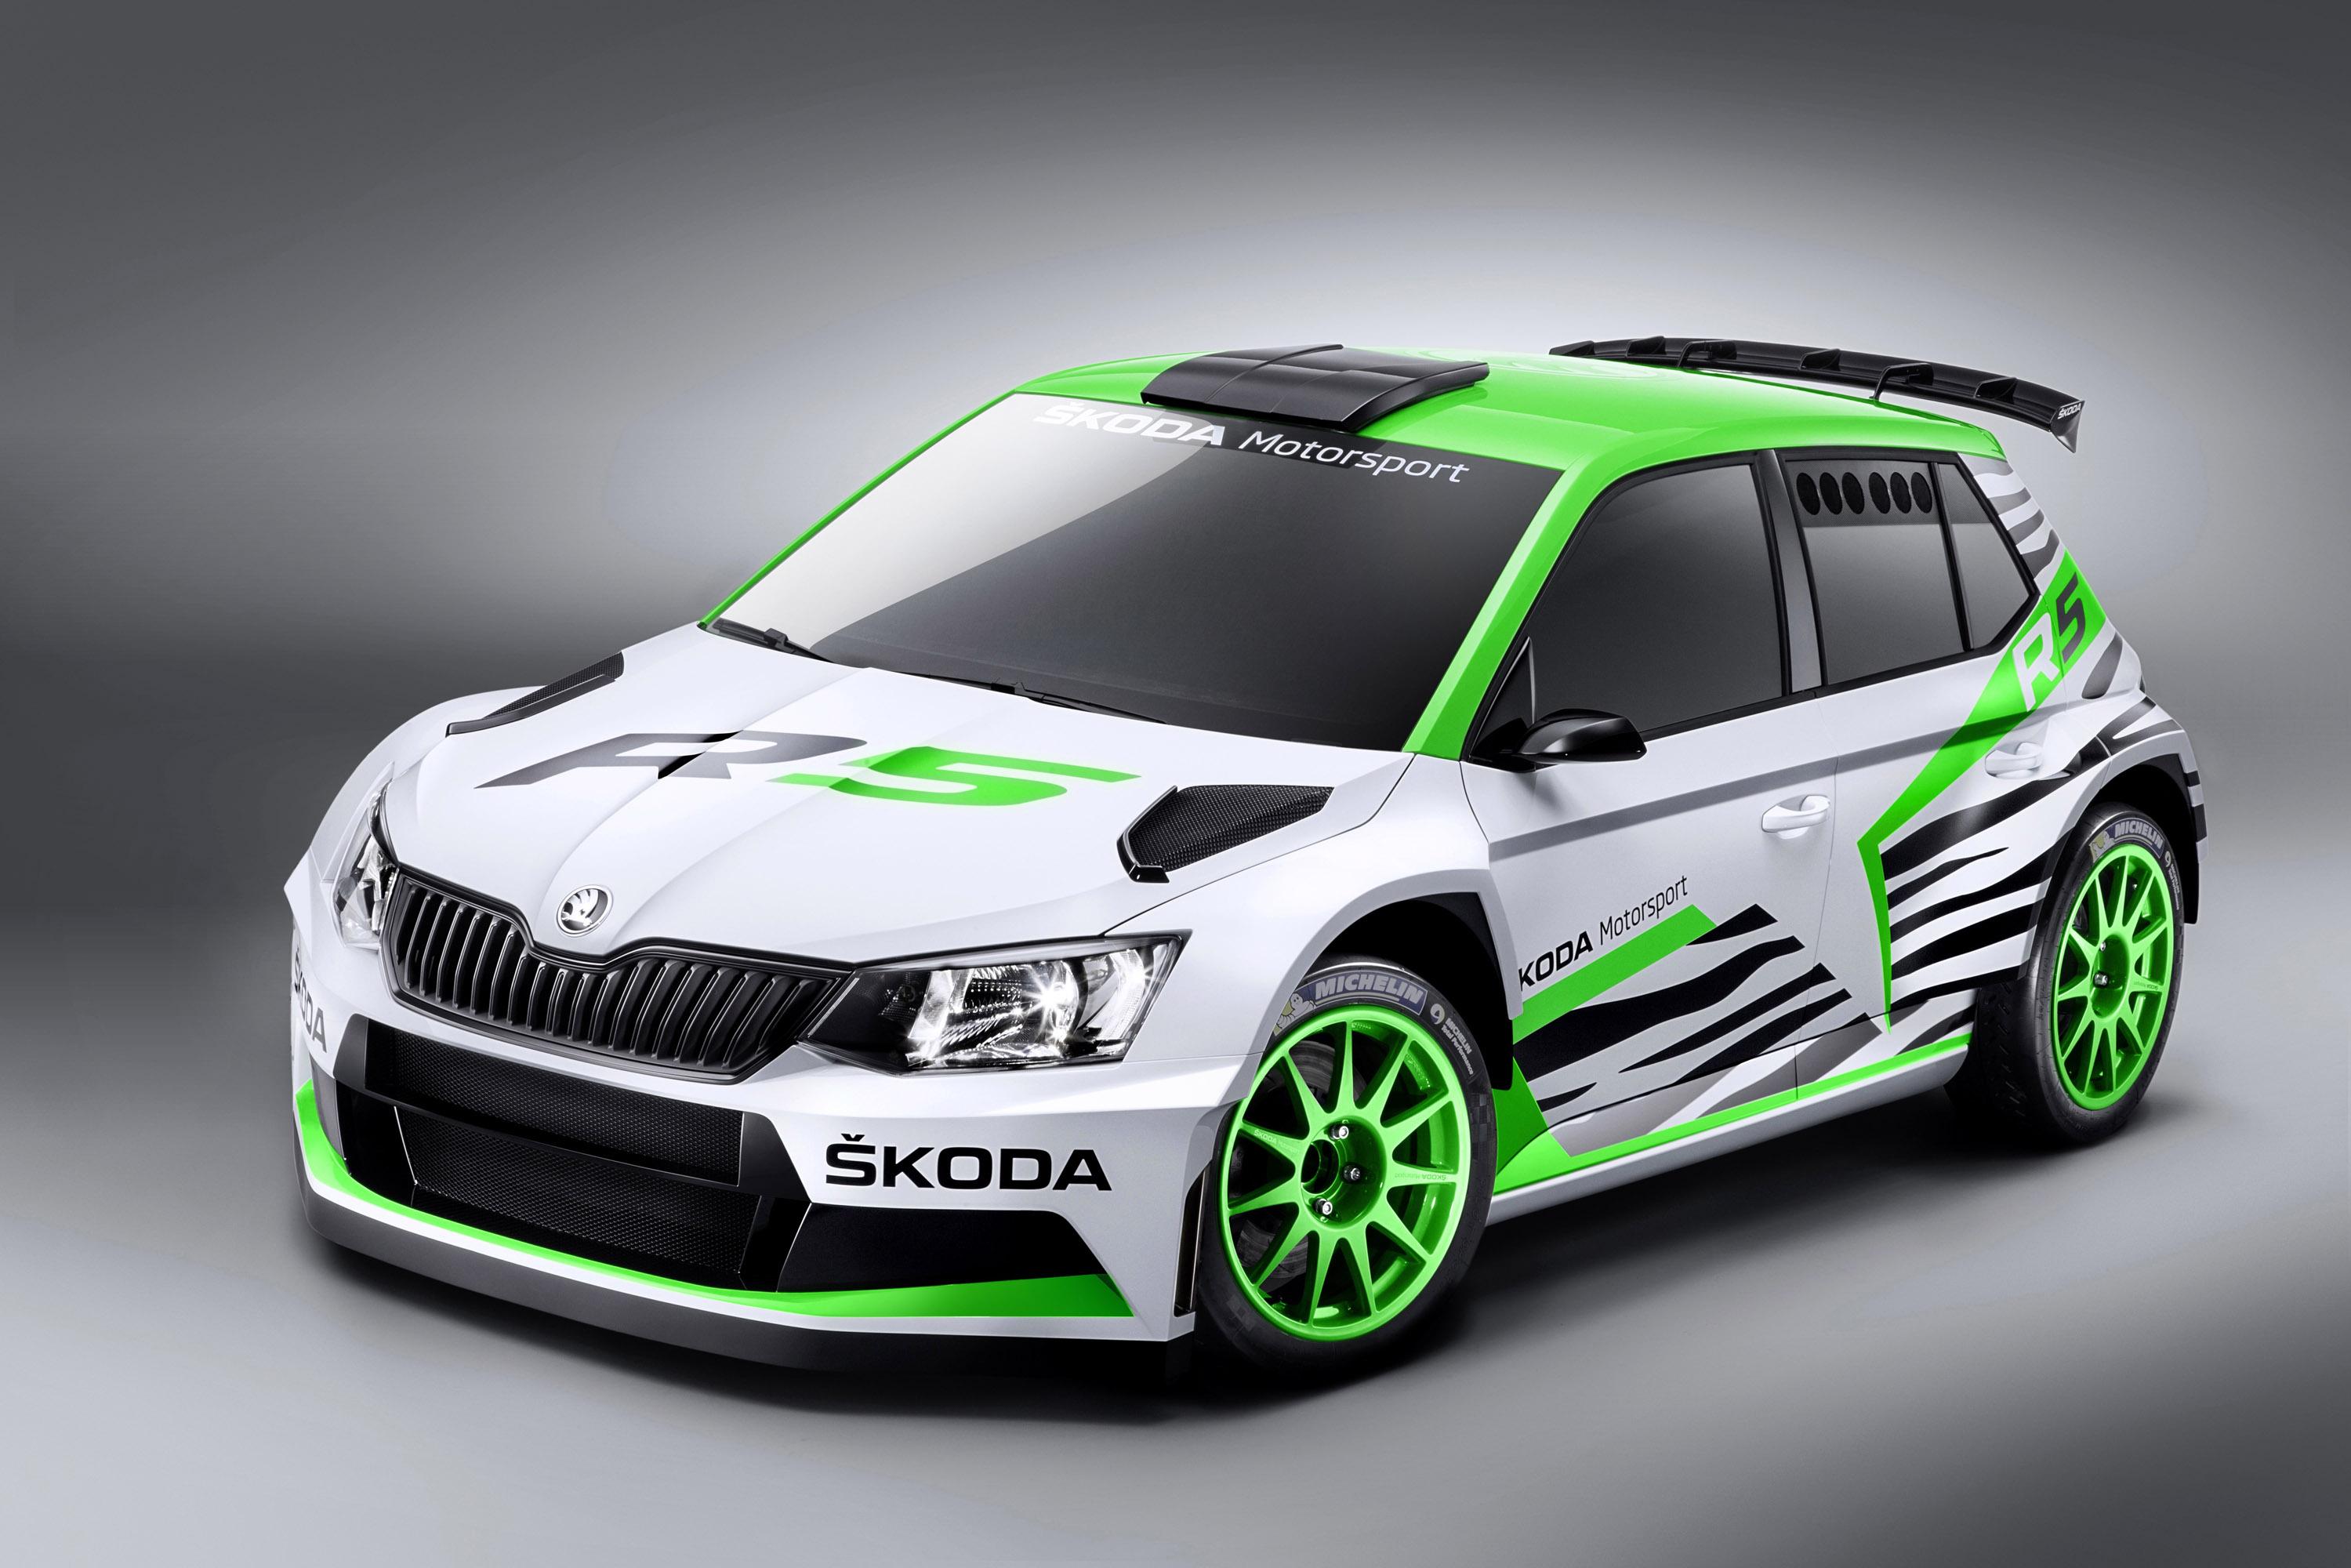 Skoda Fabia R 5 Concept Makes World Premiere at Essen Motor Show